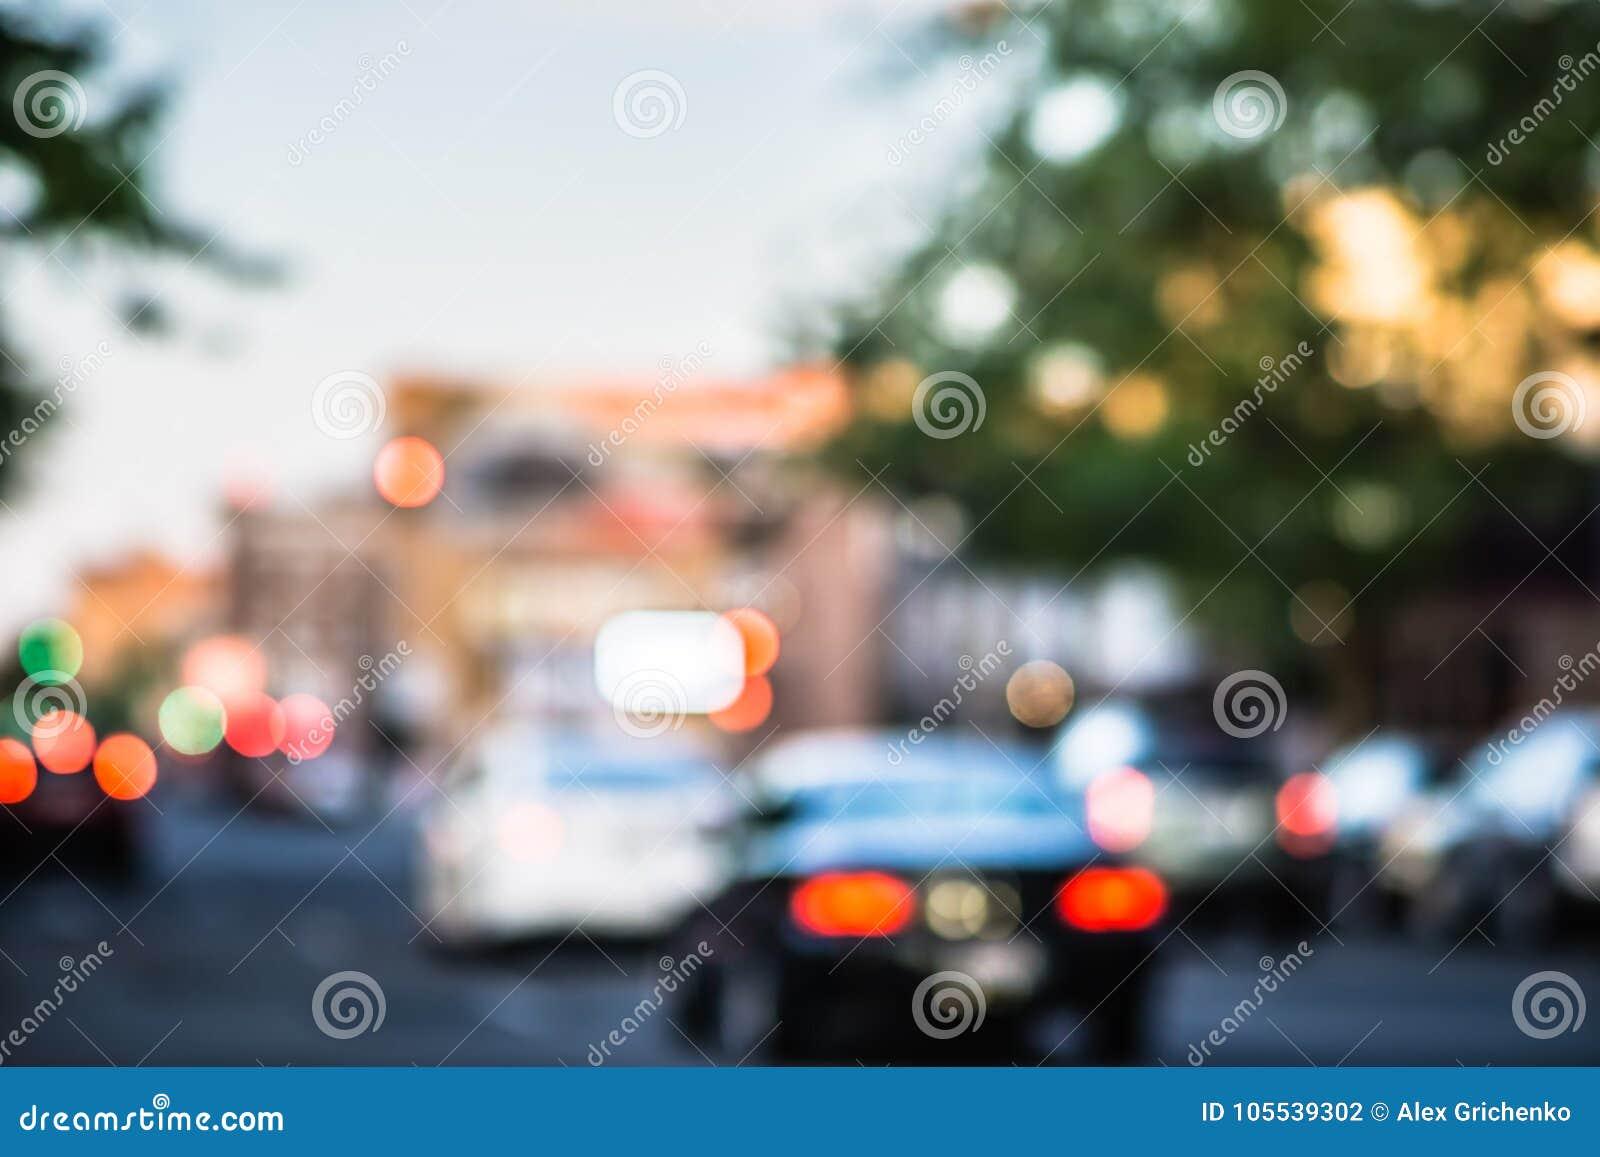 Blurry soft focus of city streets in spokane washington